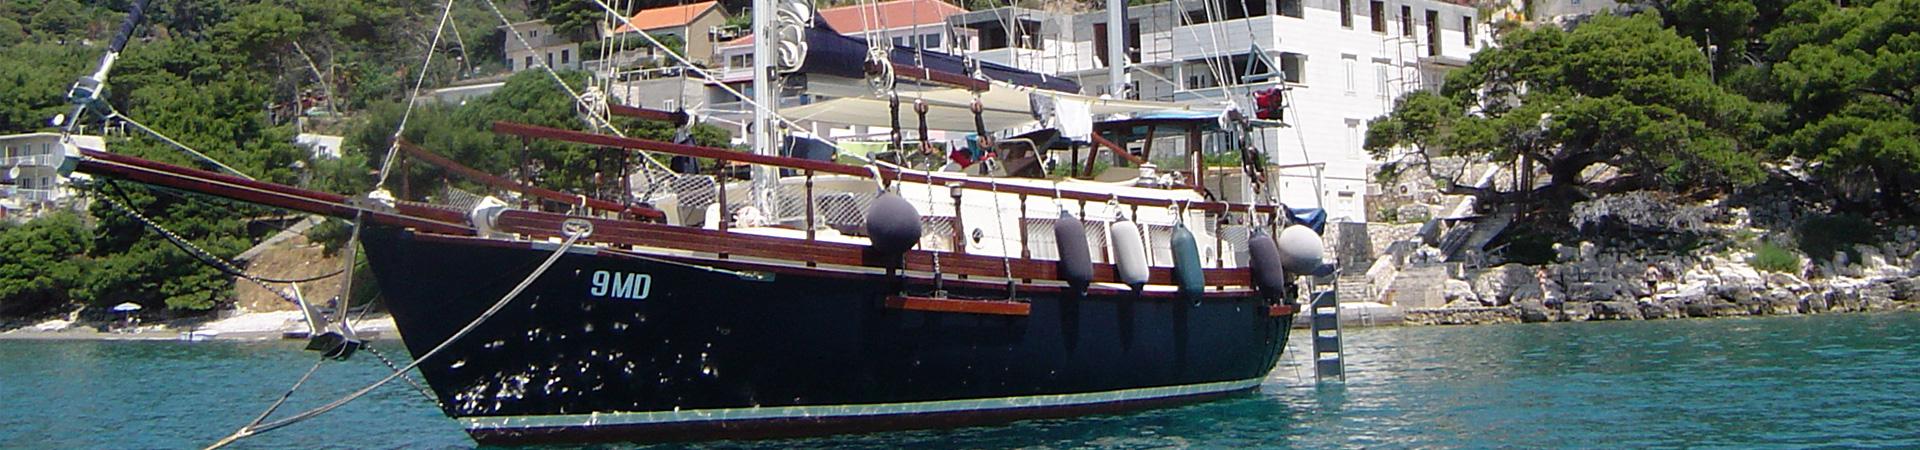 yachtcharter kroatien mit skipper